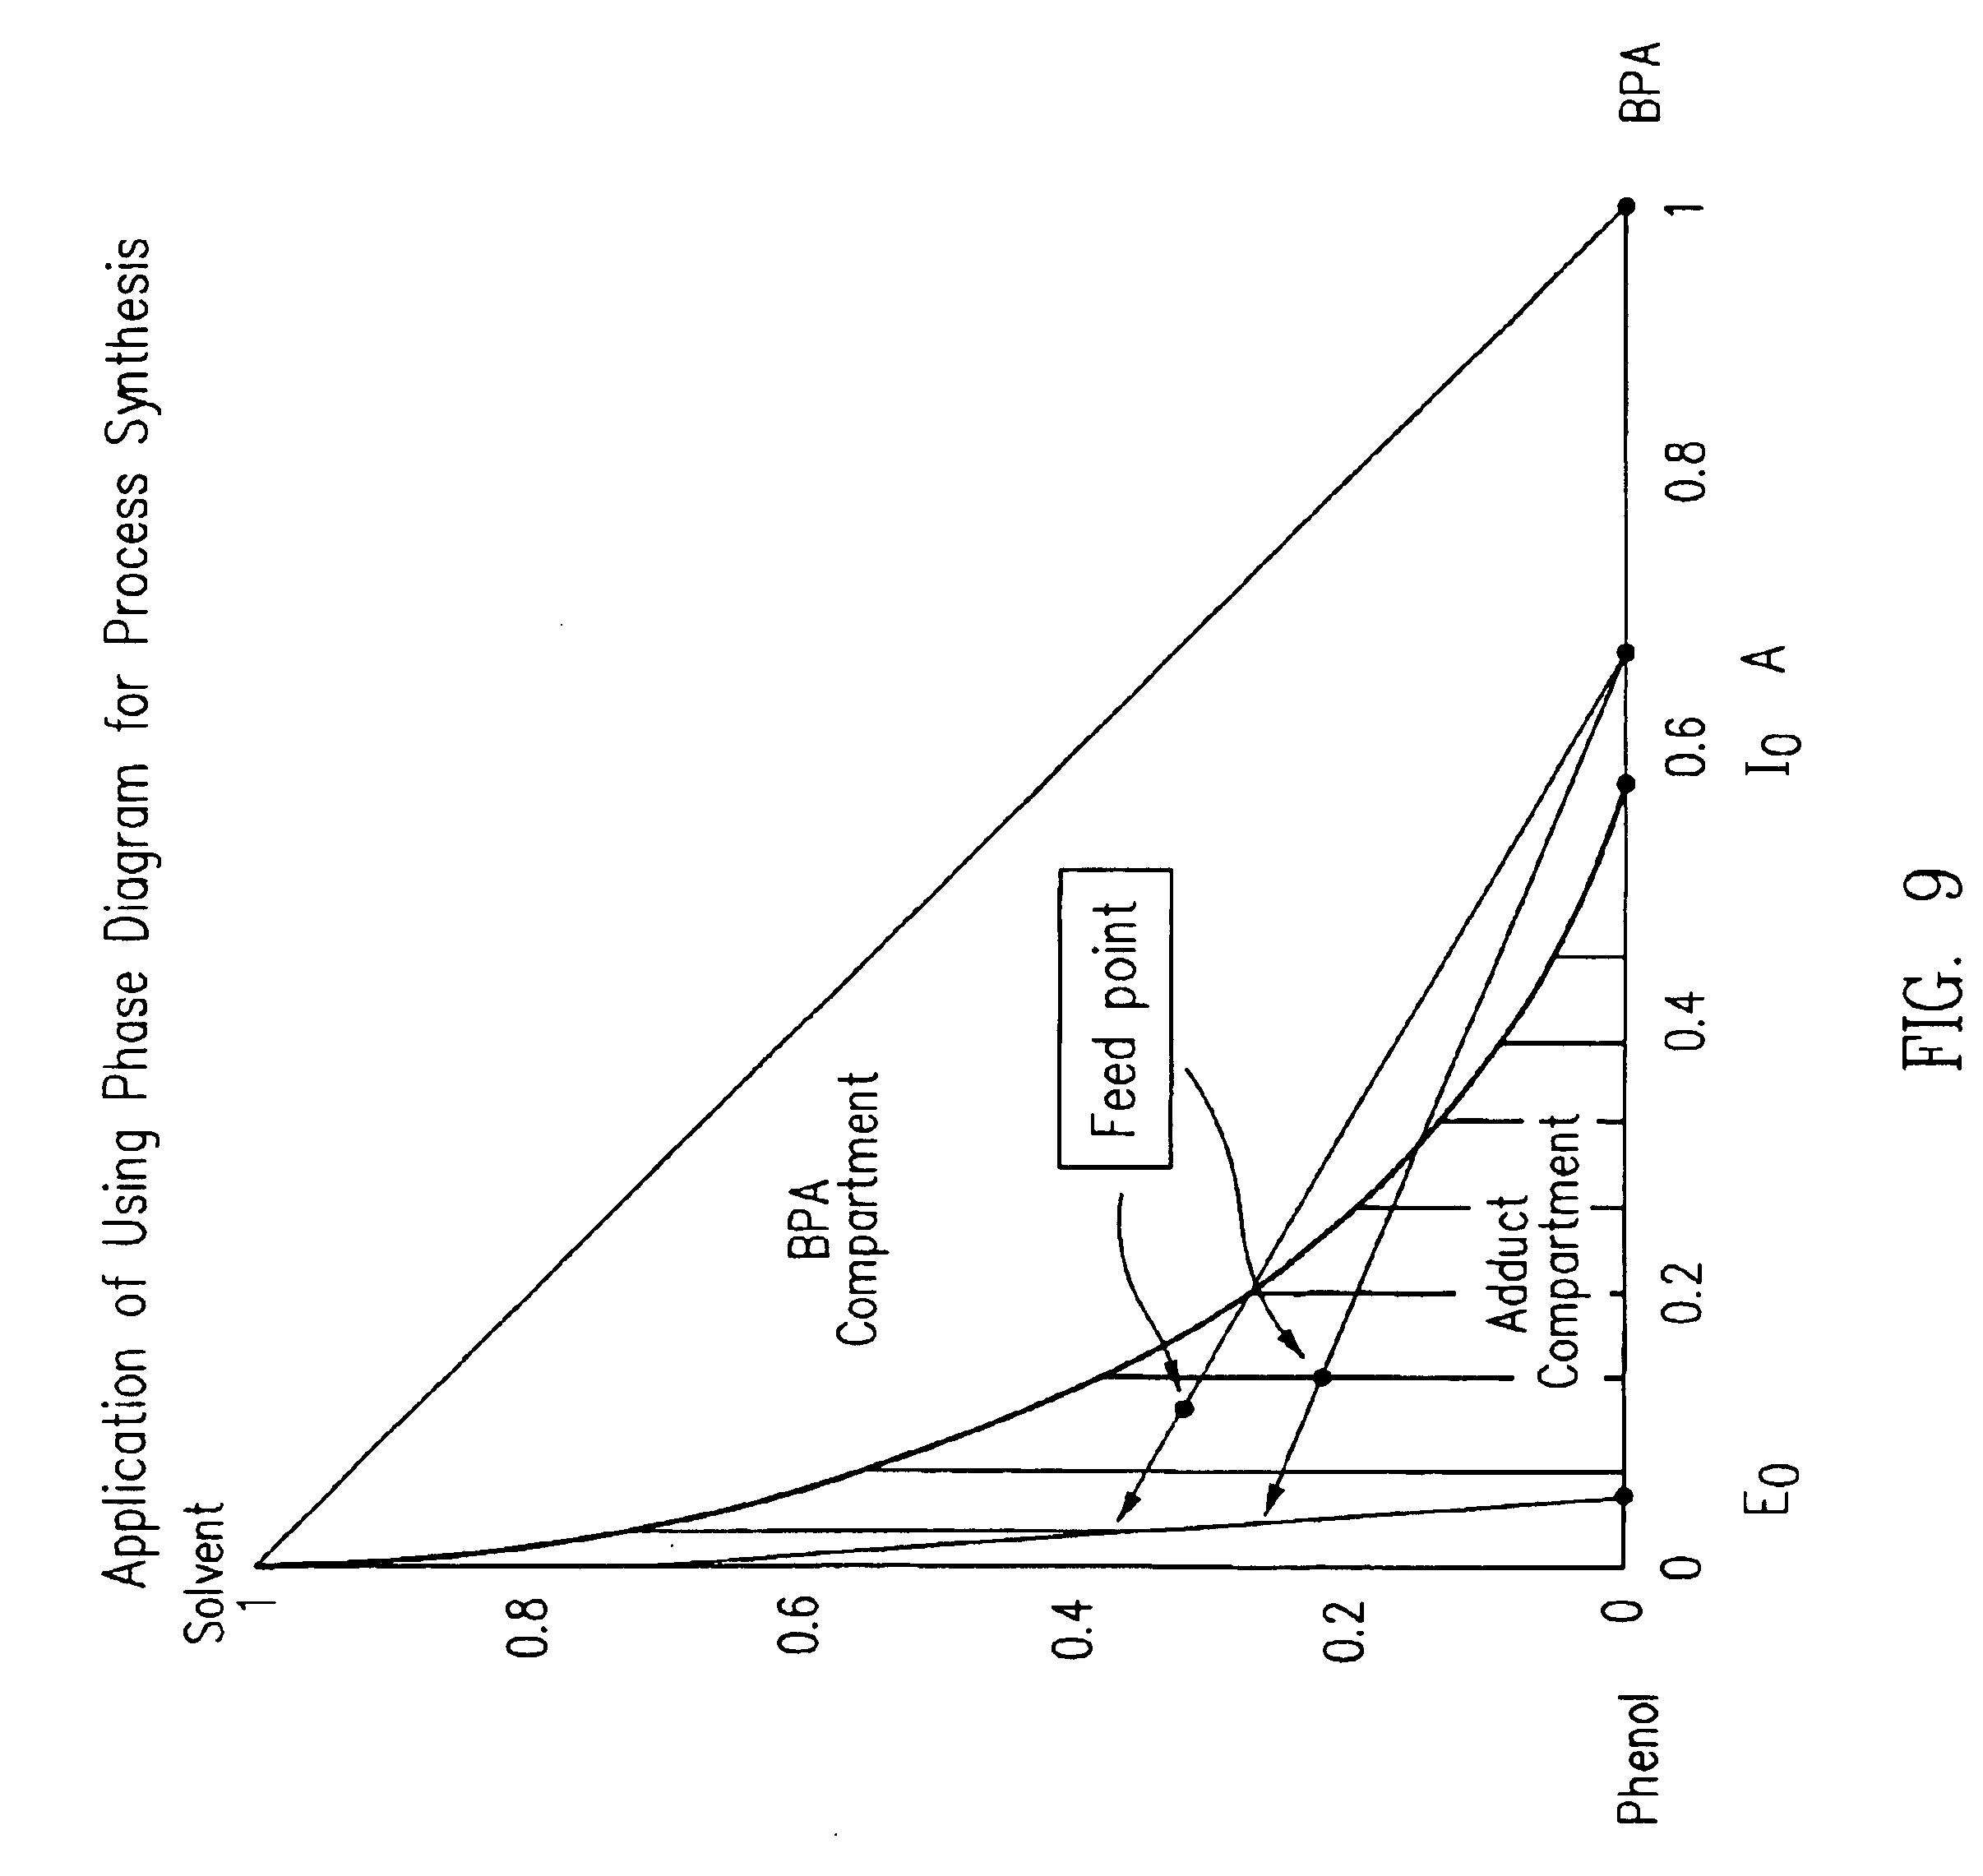 1994 fzr 600 wiring diagram